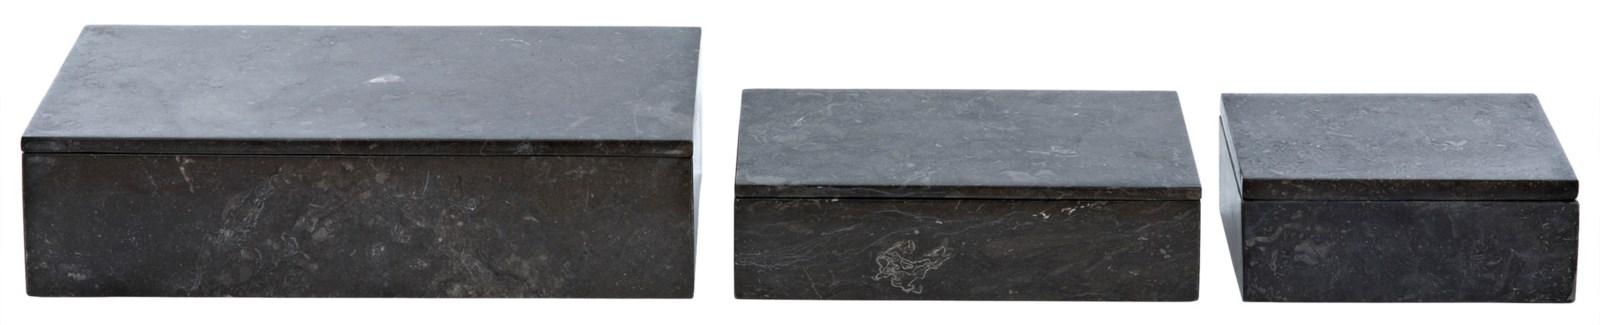 Pandora 3 pc. Set, Black Marble